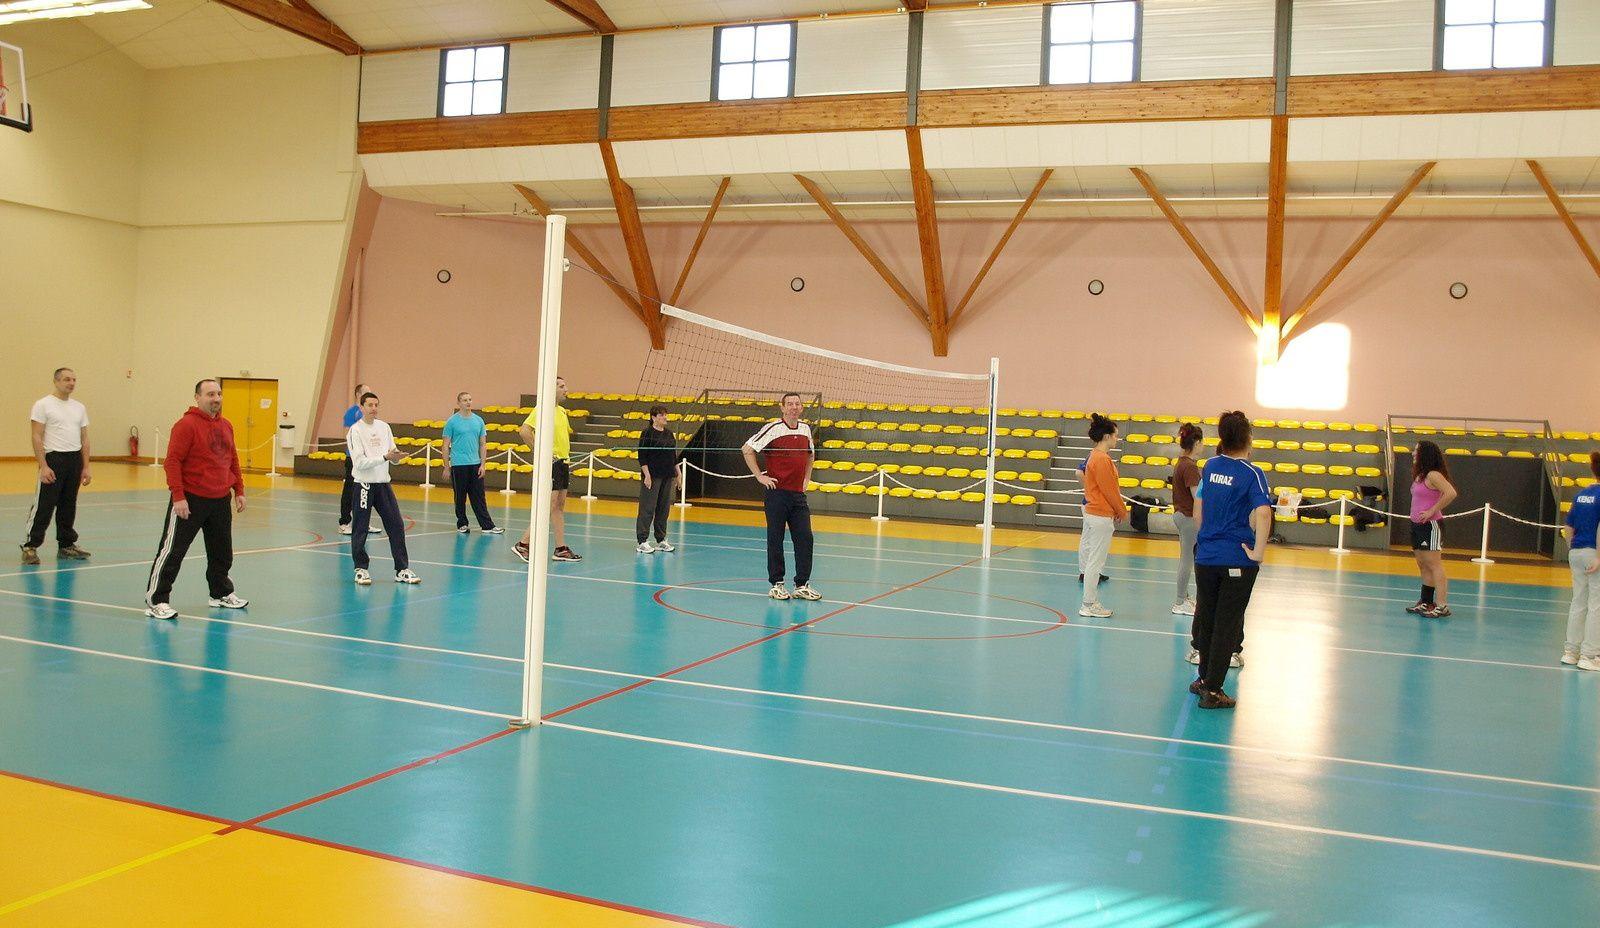 Tournoi de Volley hors norme